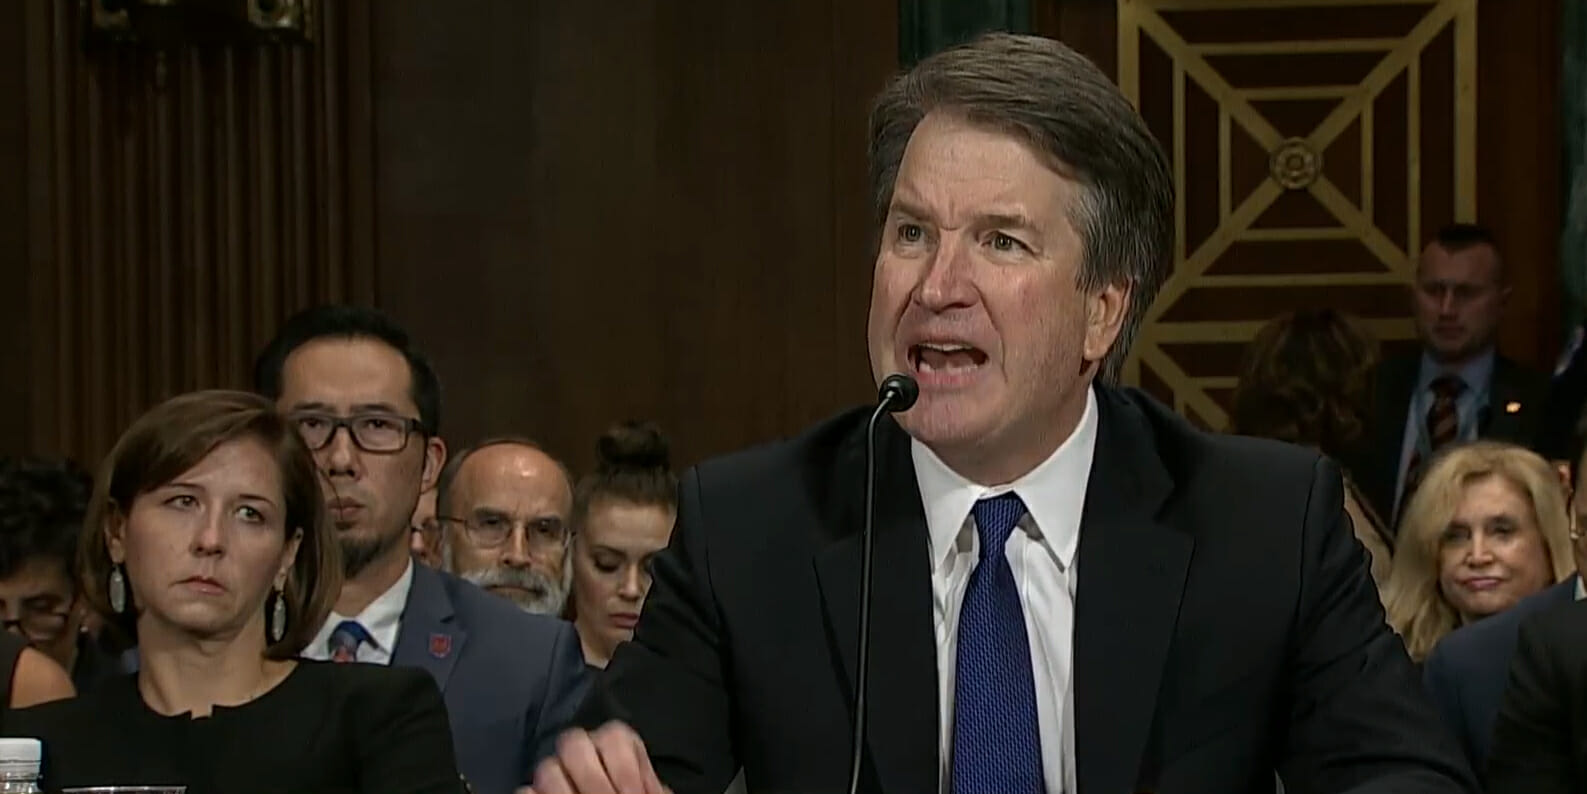 Supreme Court nominee Brett Kavanaugh giving his opening statement ( source )